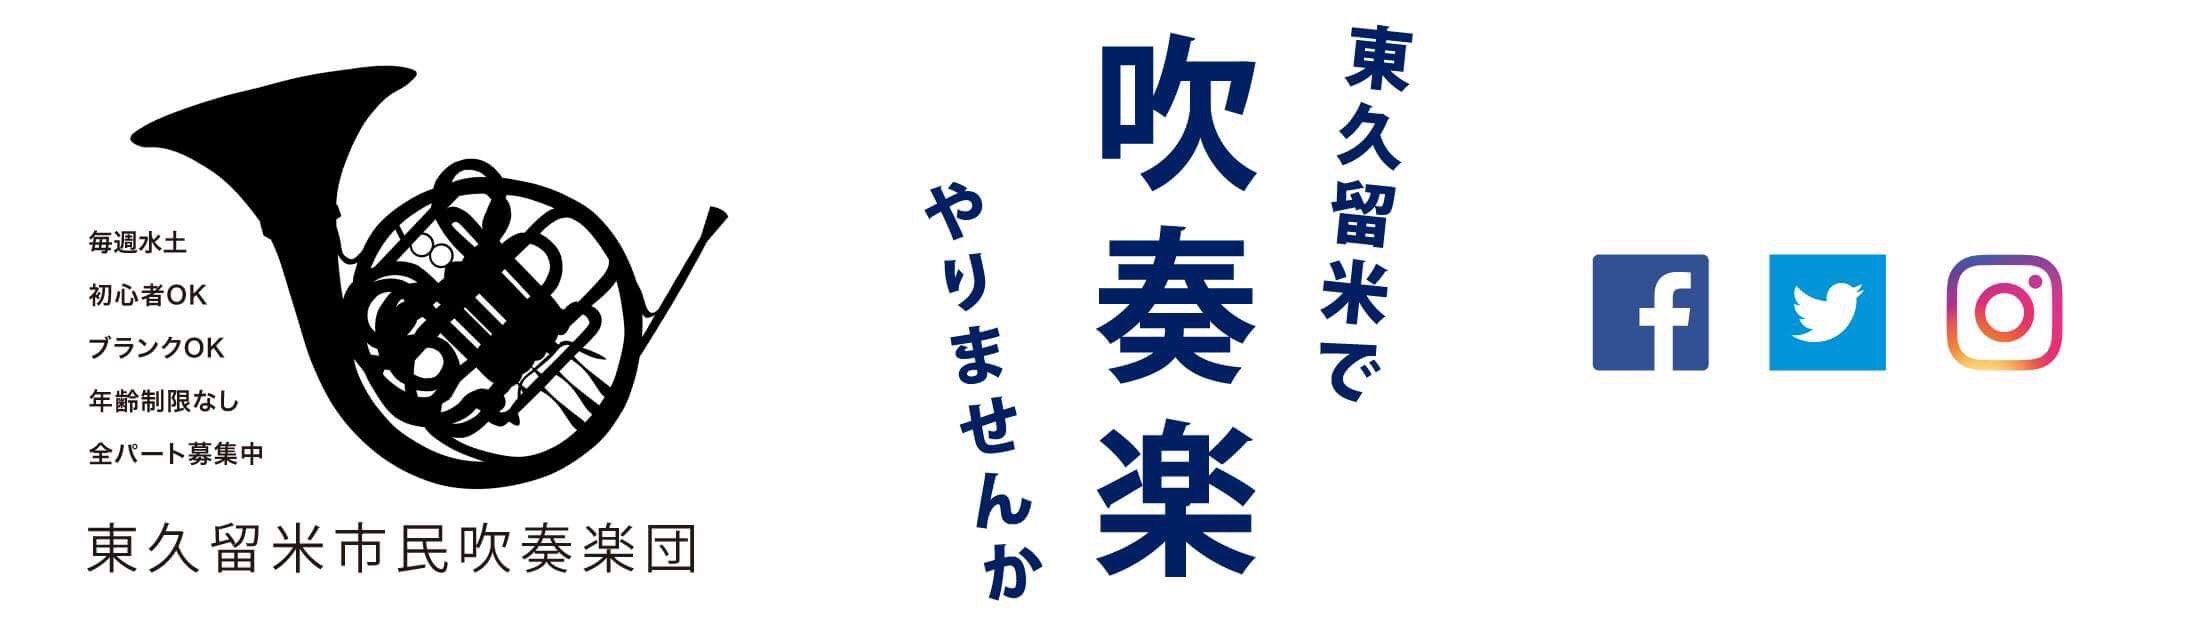 memberInfo